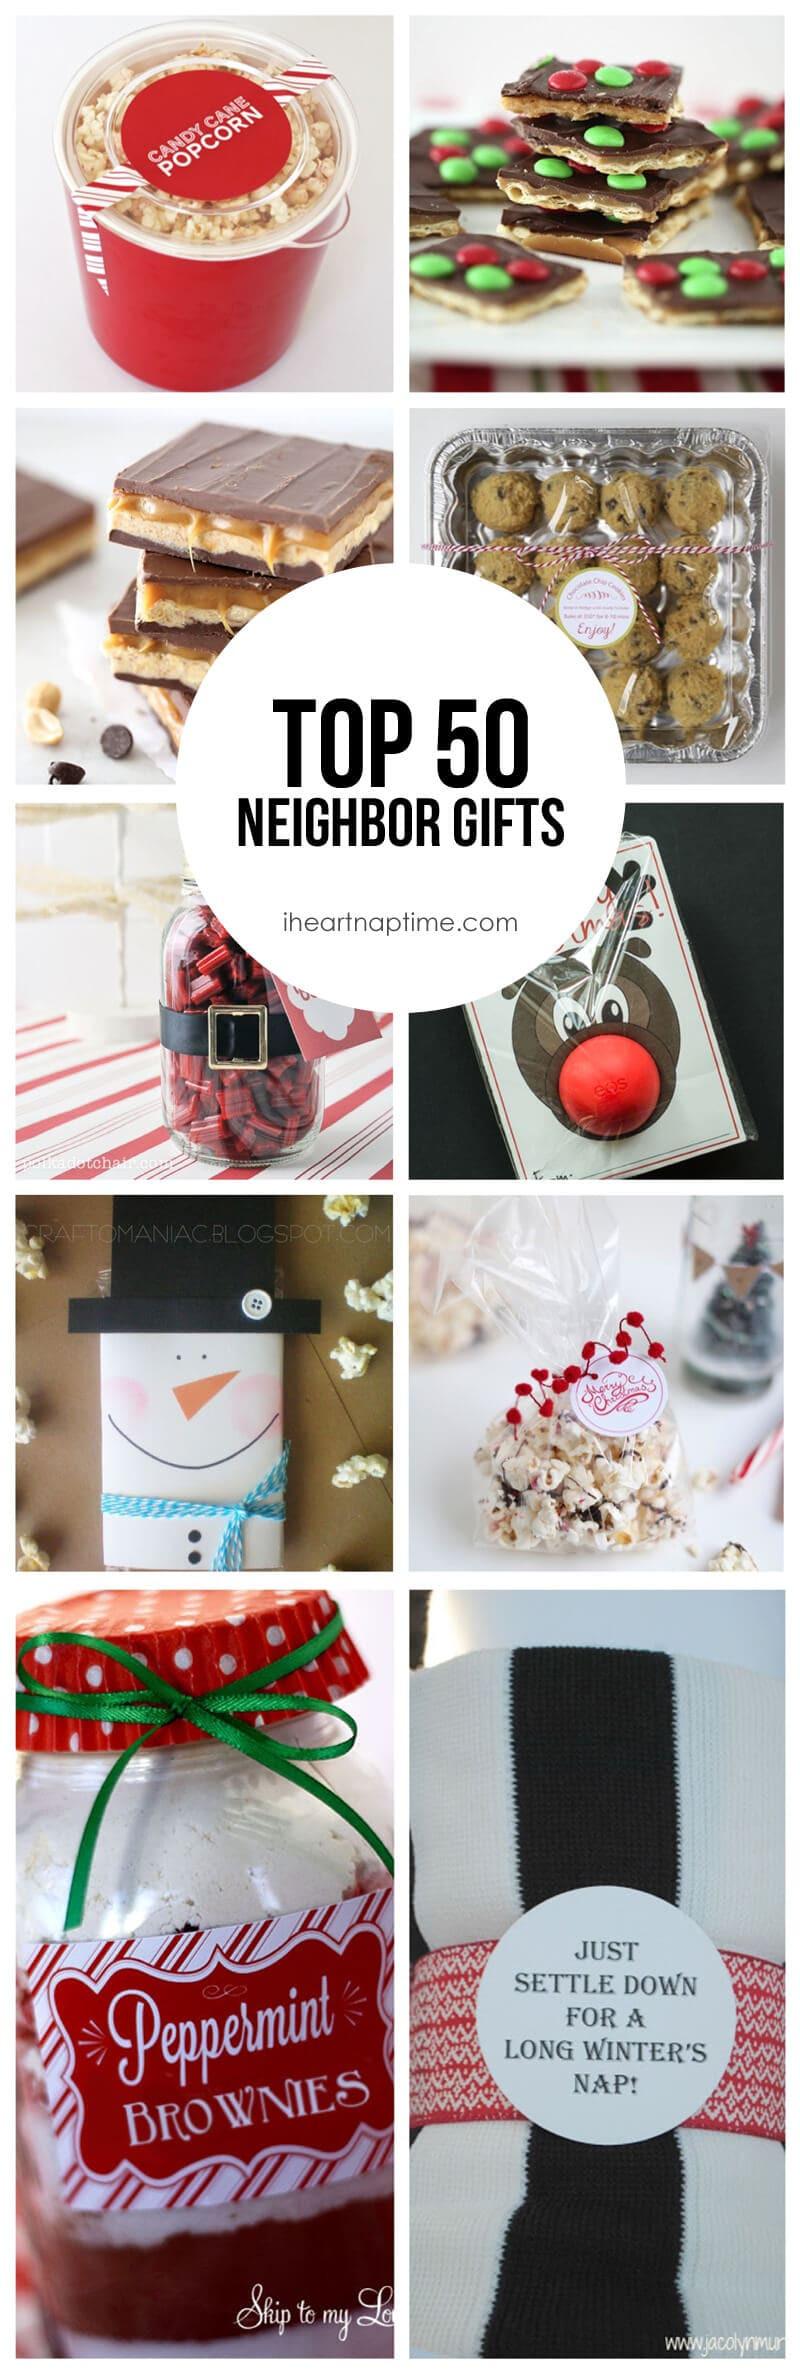 Holiday Gift Ideas For Neighbors  Top 50 Neighbor Gift Ideas I Heart Nap Time